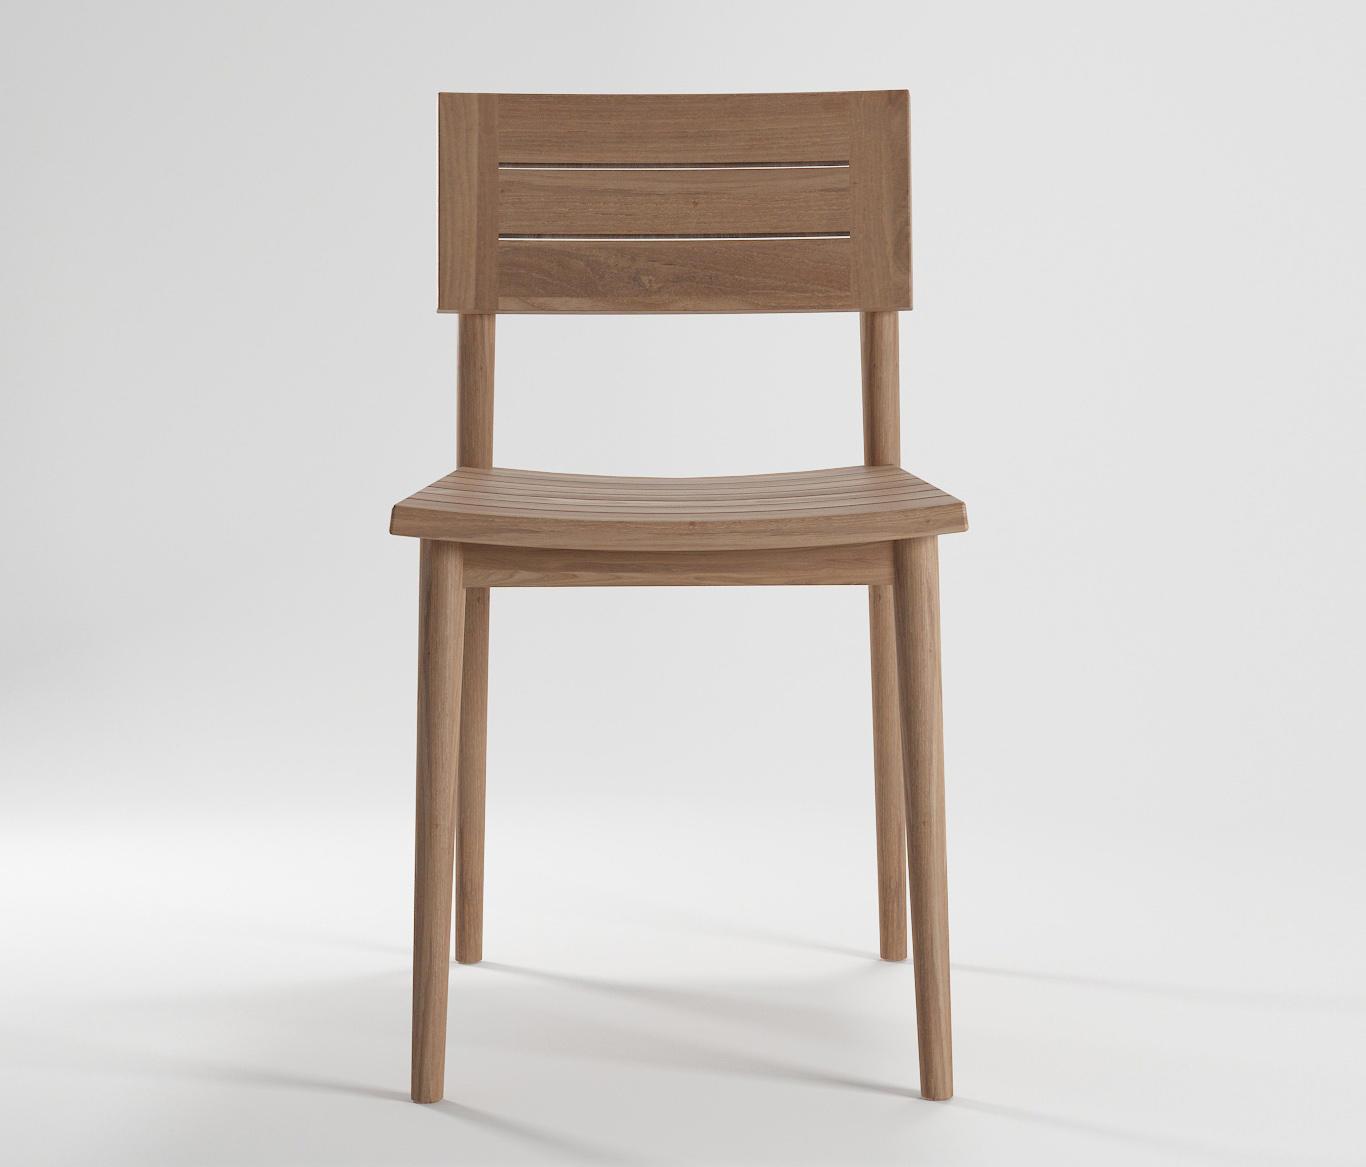 VINTAGE OUTDOOR DINING CHAIR Garden chairs from Karpenter